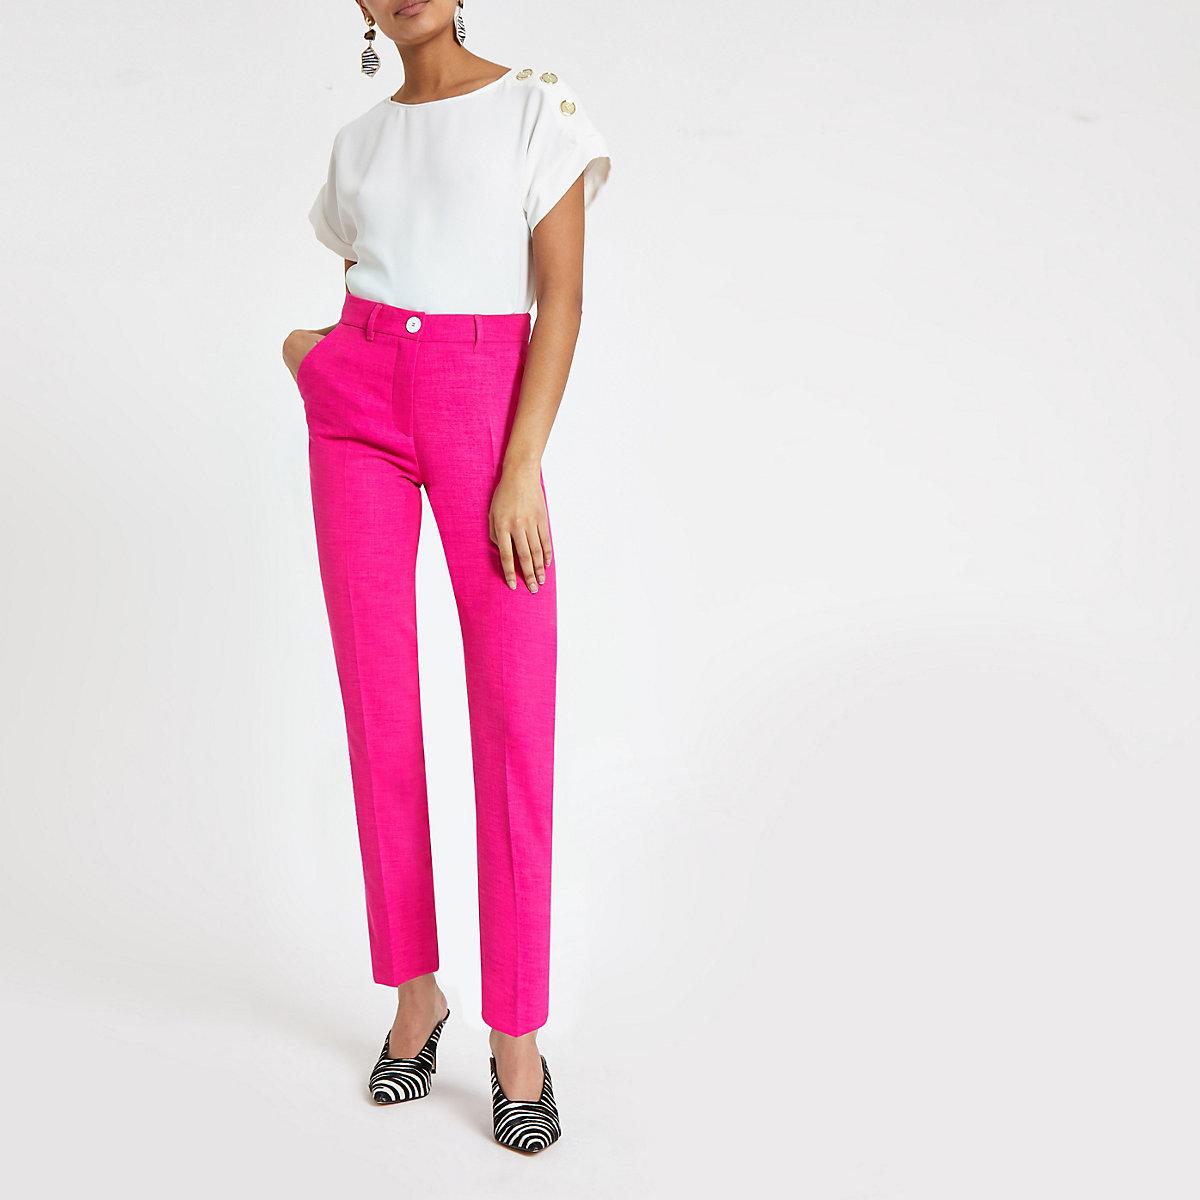 Pink cigarette pants